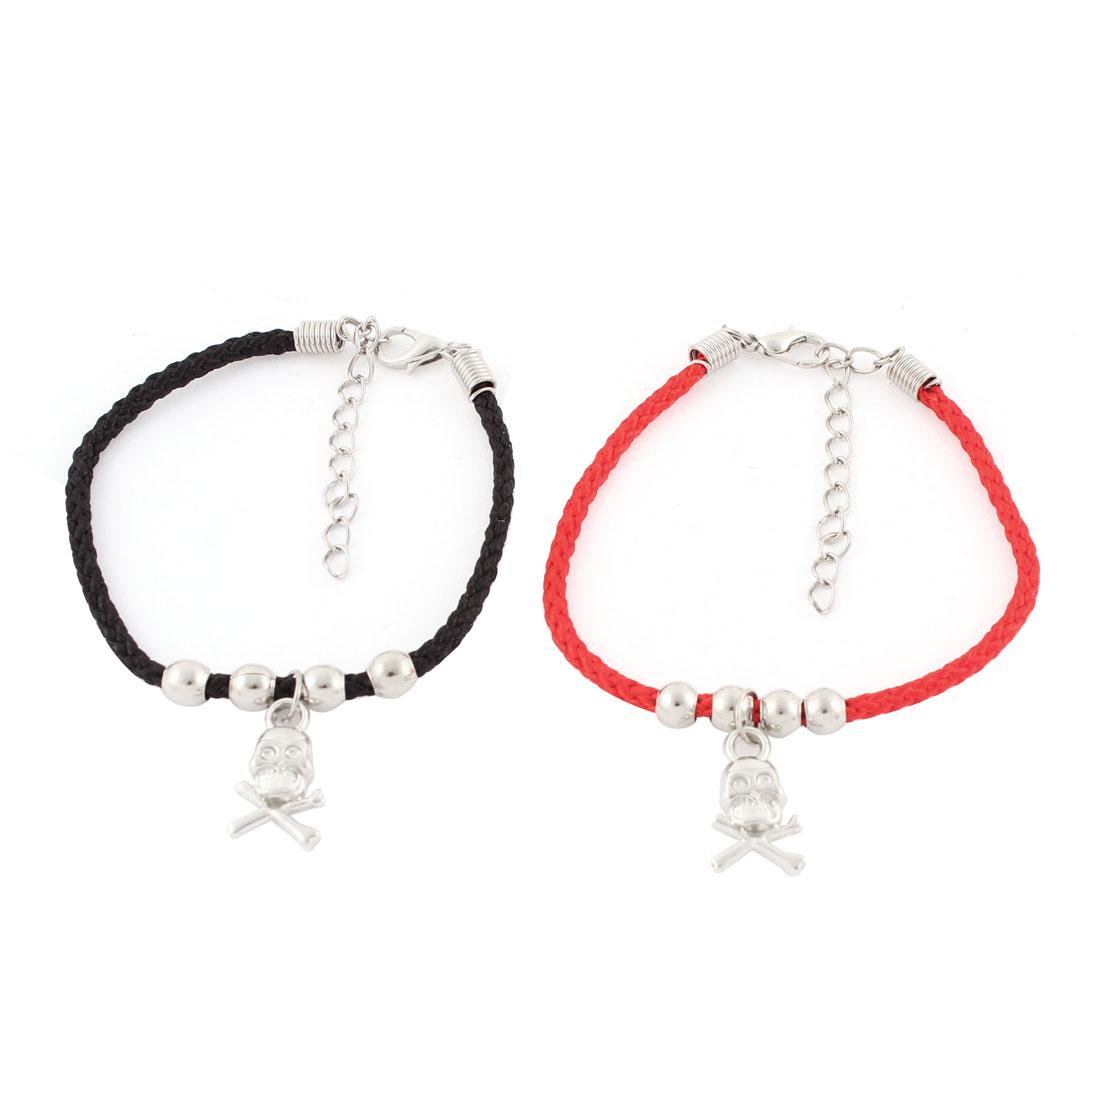 2Pcs Nylon String Buckle Chain Skull Pendant Couple Bracelets Bangle